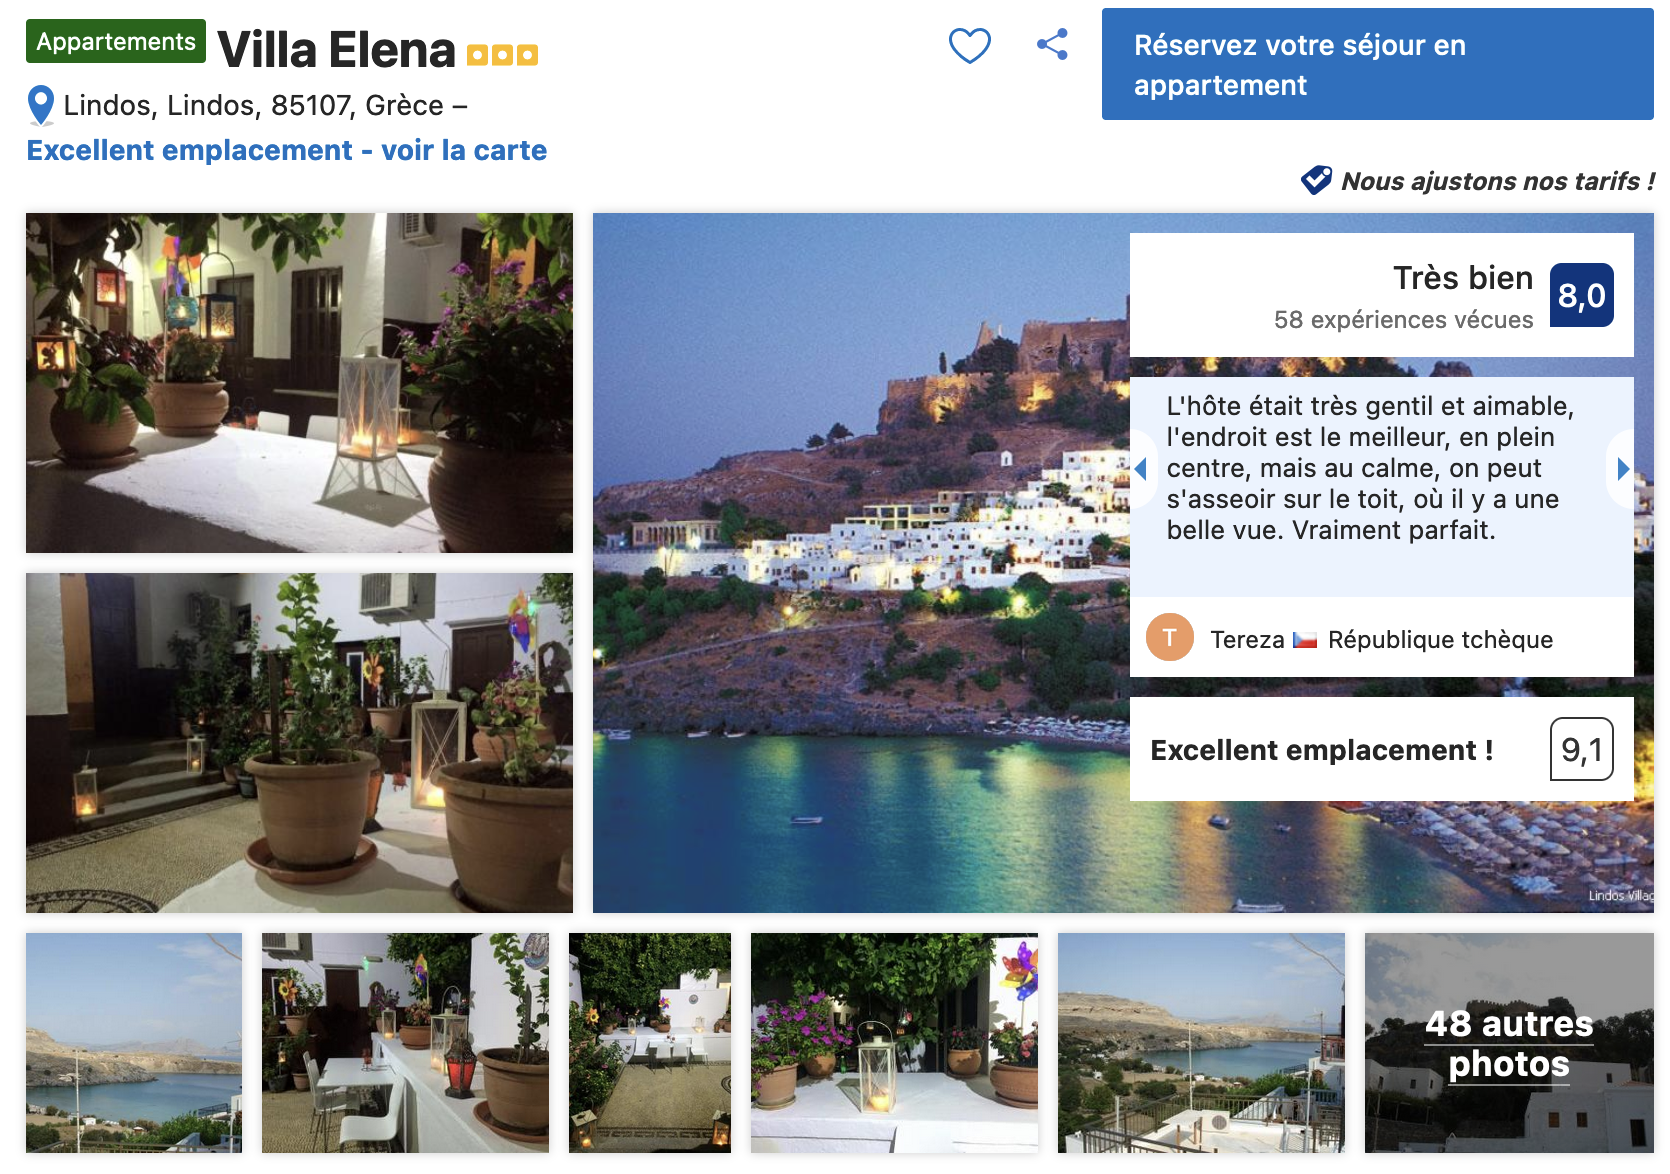 rhodes-hotel-blanc-style-grec-a-cote-acropole-lindos